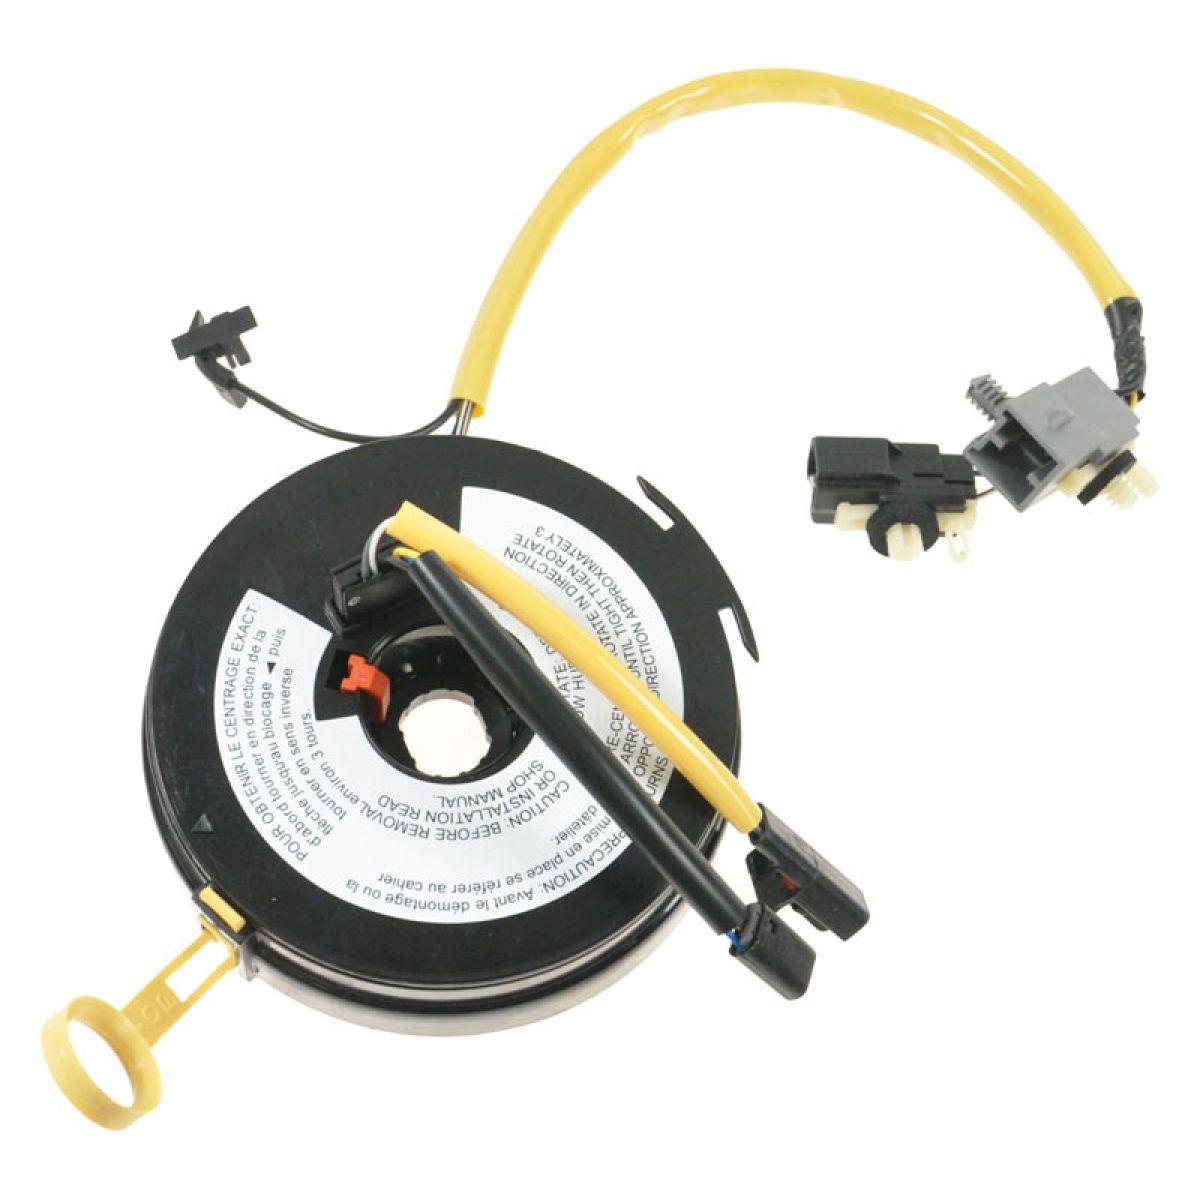 Airbag Replacement Cost >> Dorman Air Bag Airbag Clockspring for ford Mustang Taurus Mercury Sable | eBay